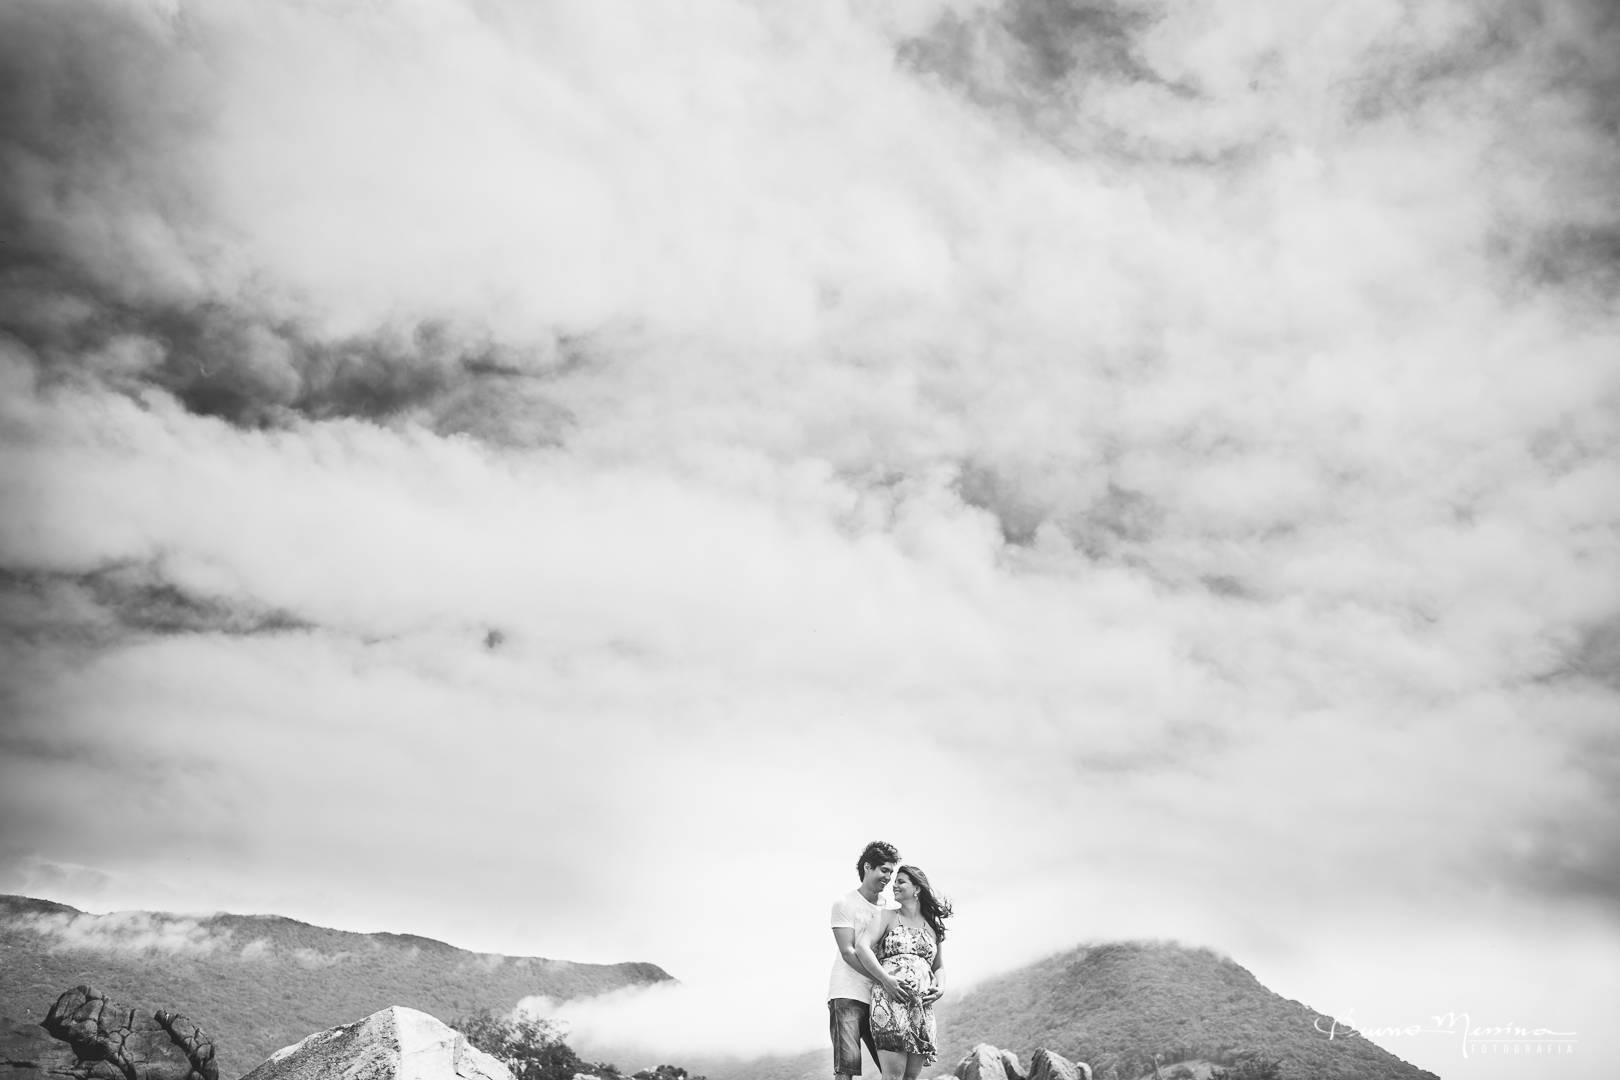 bruno messina casalinghi mauris - photo#37